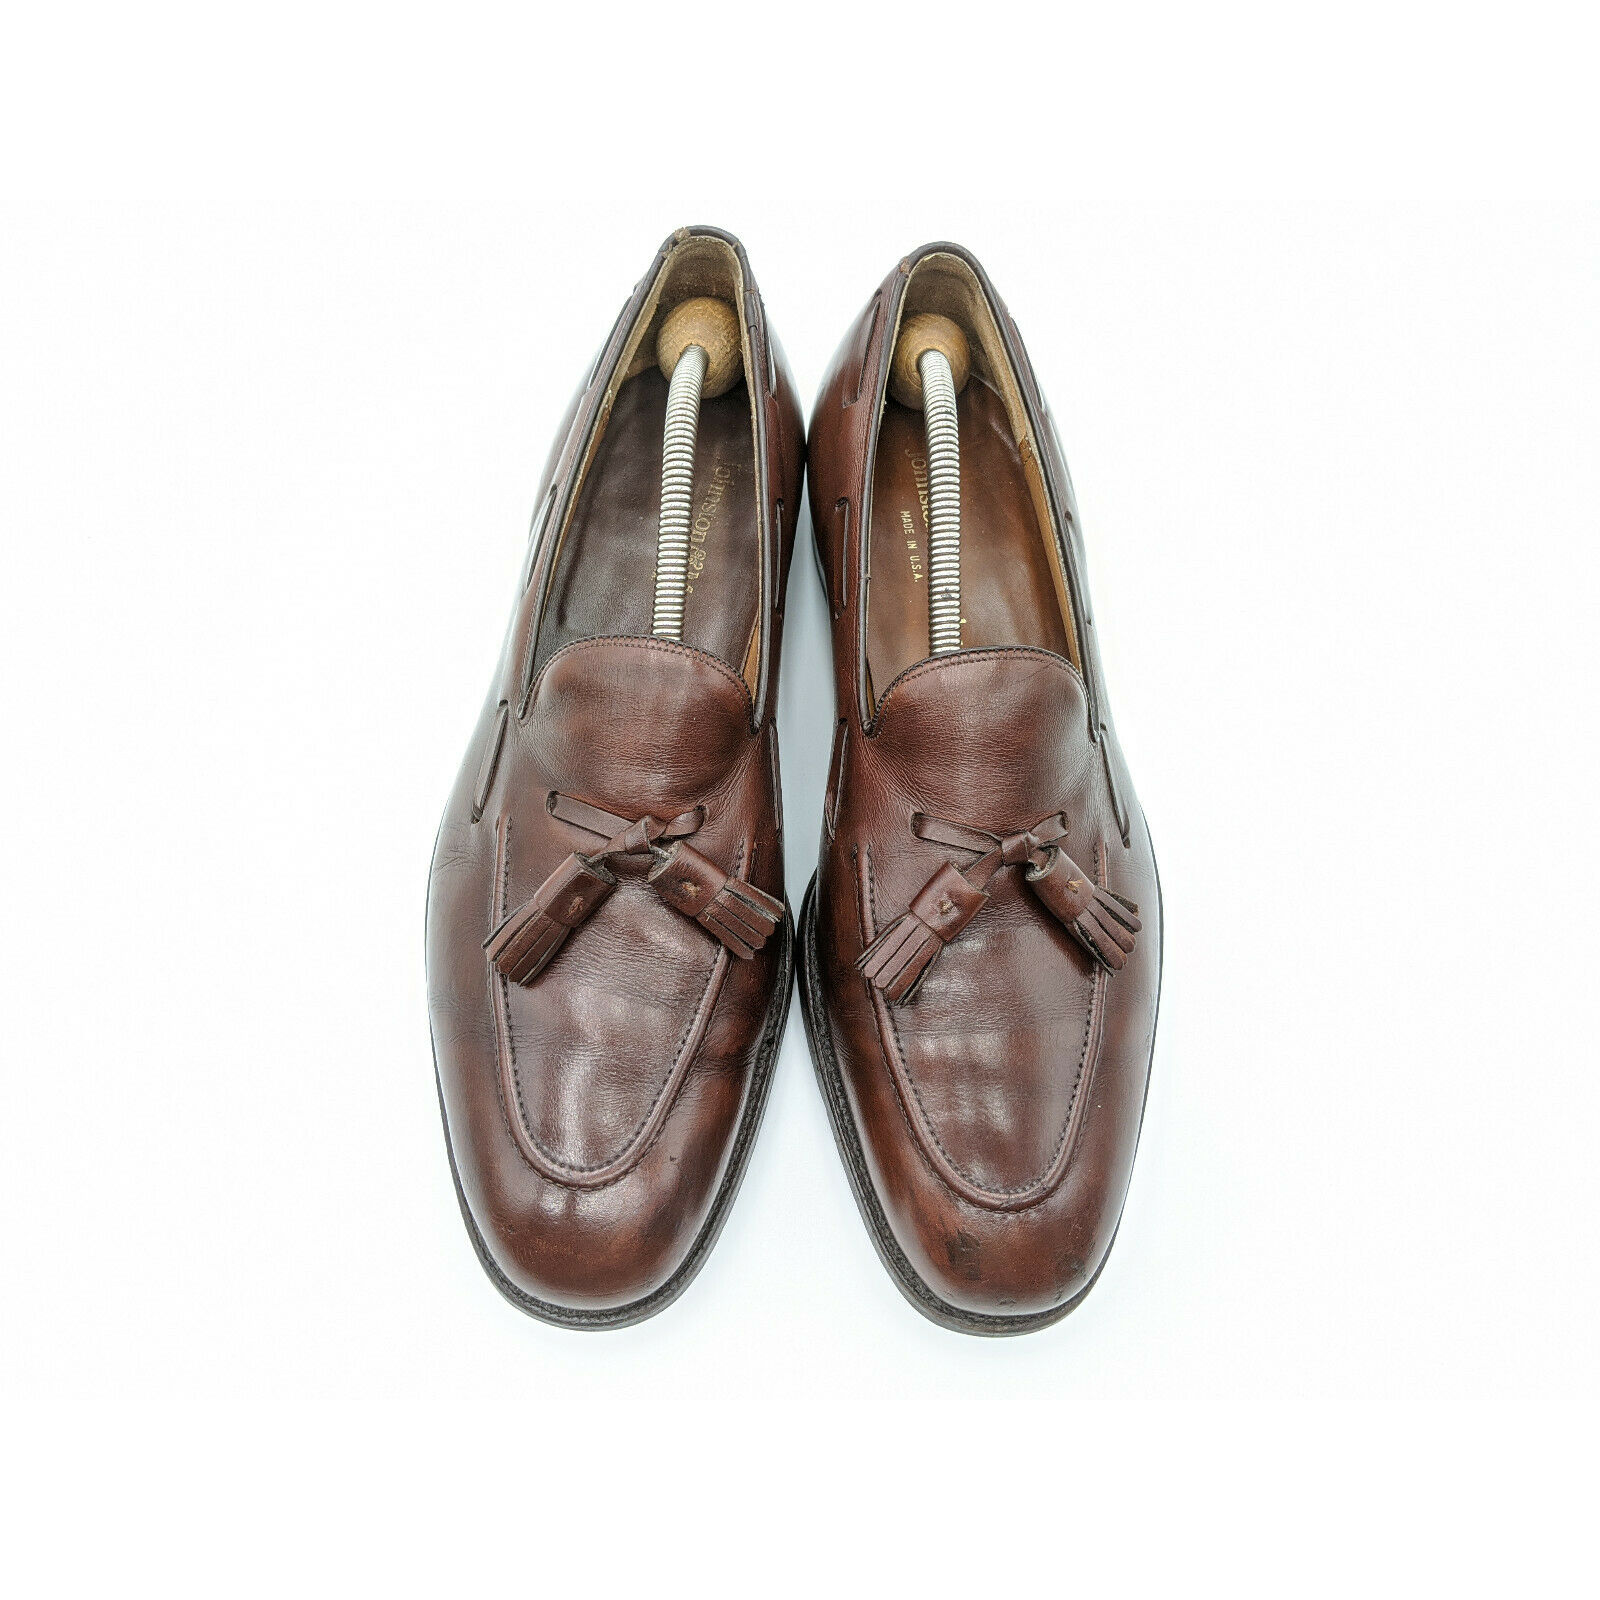 Johnston Murphy USA Brown Leather Apron Toe Tassel Dress Loafers Men 10.5 D / B